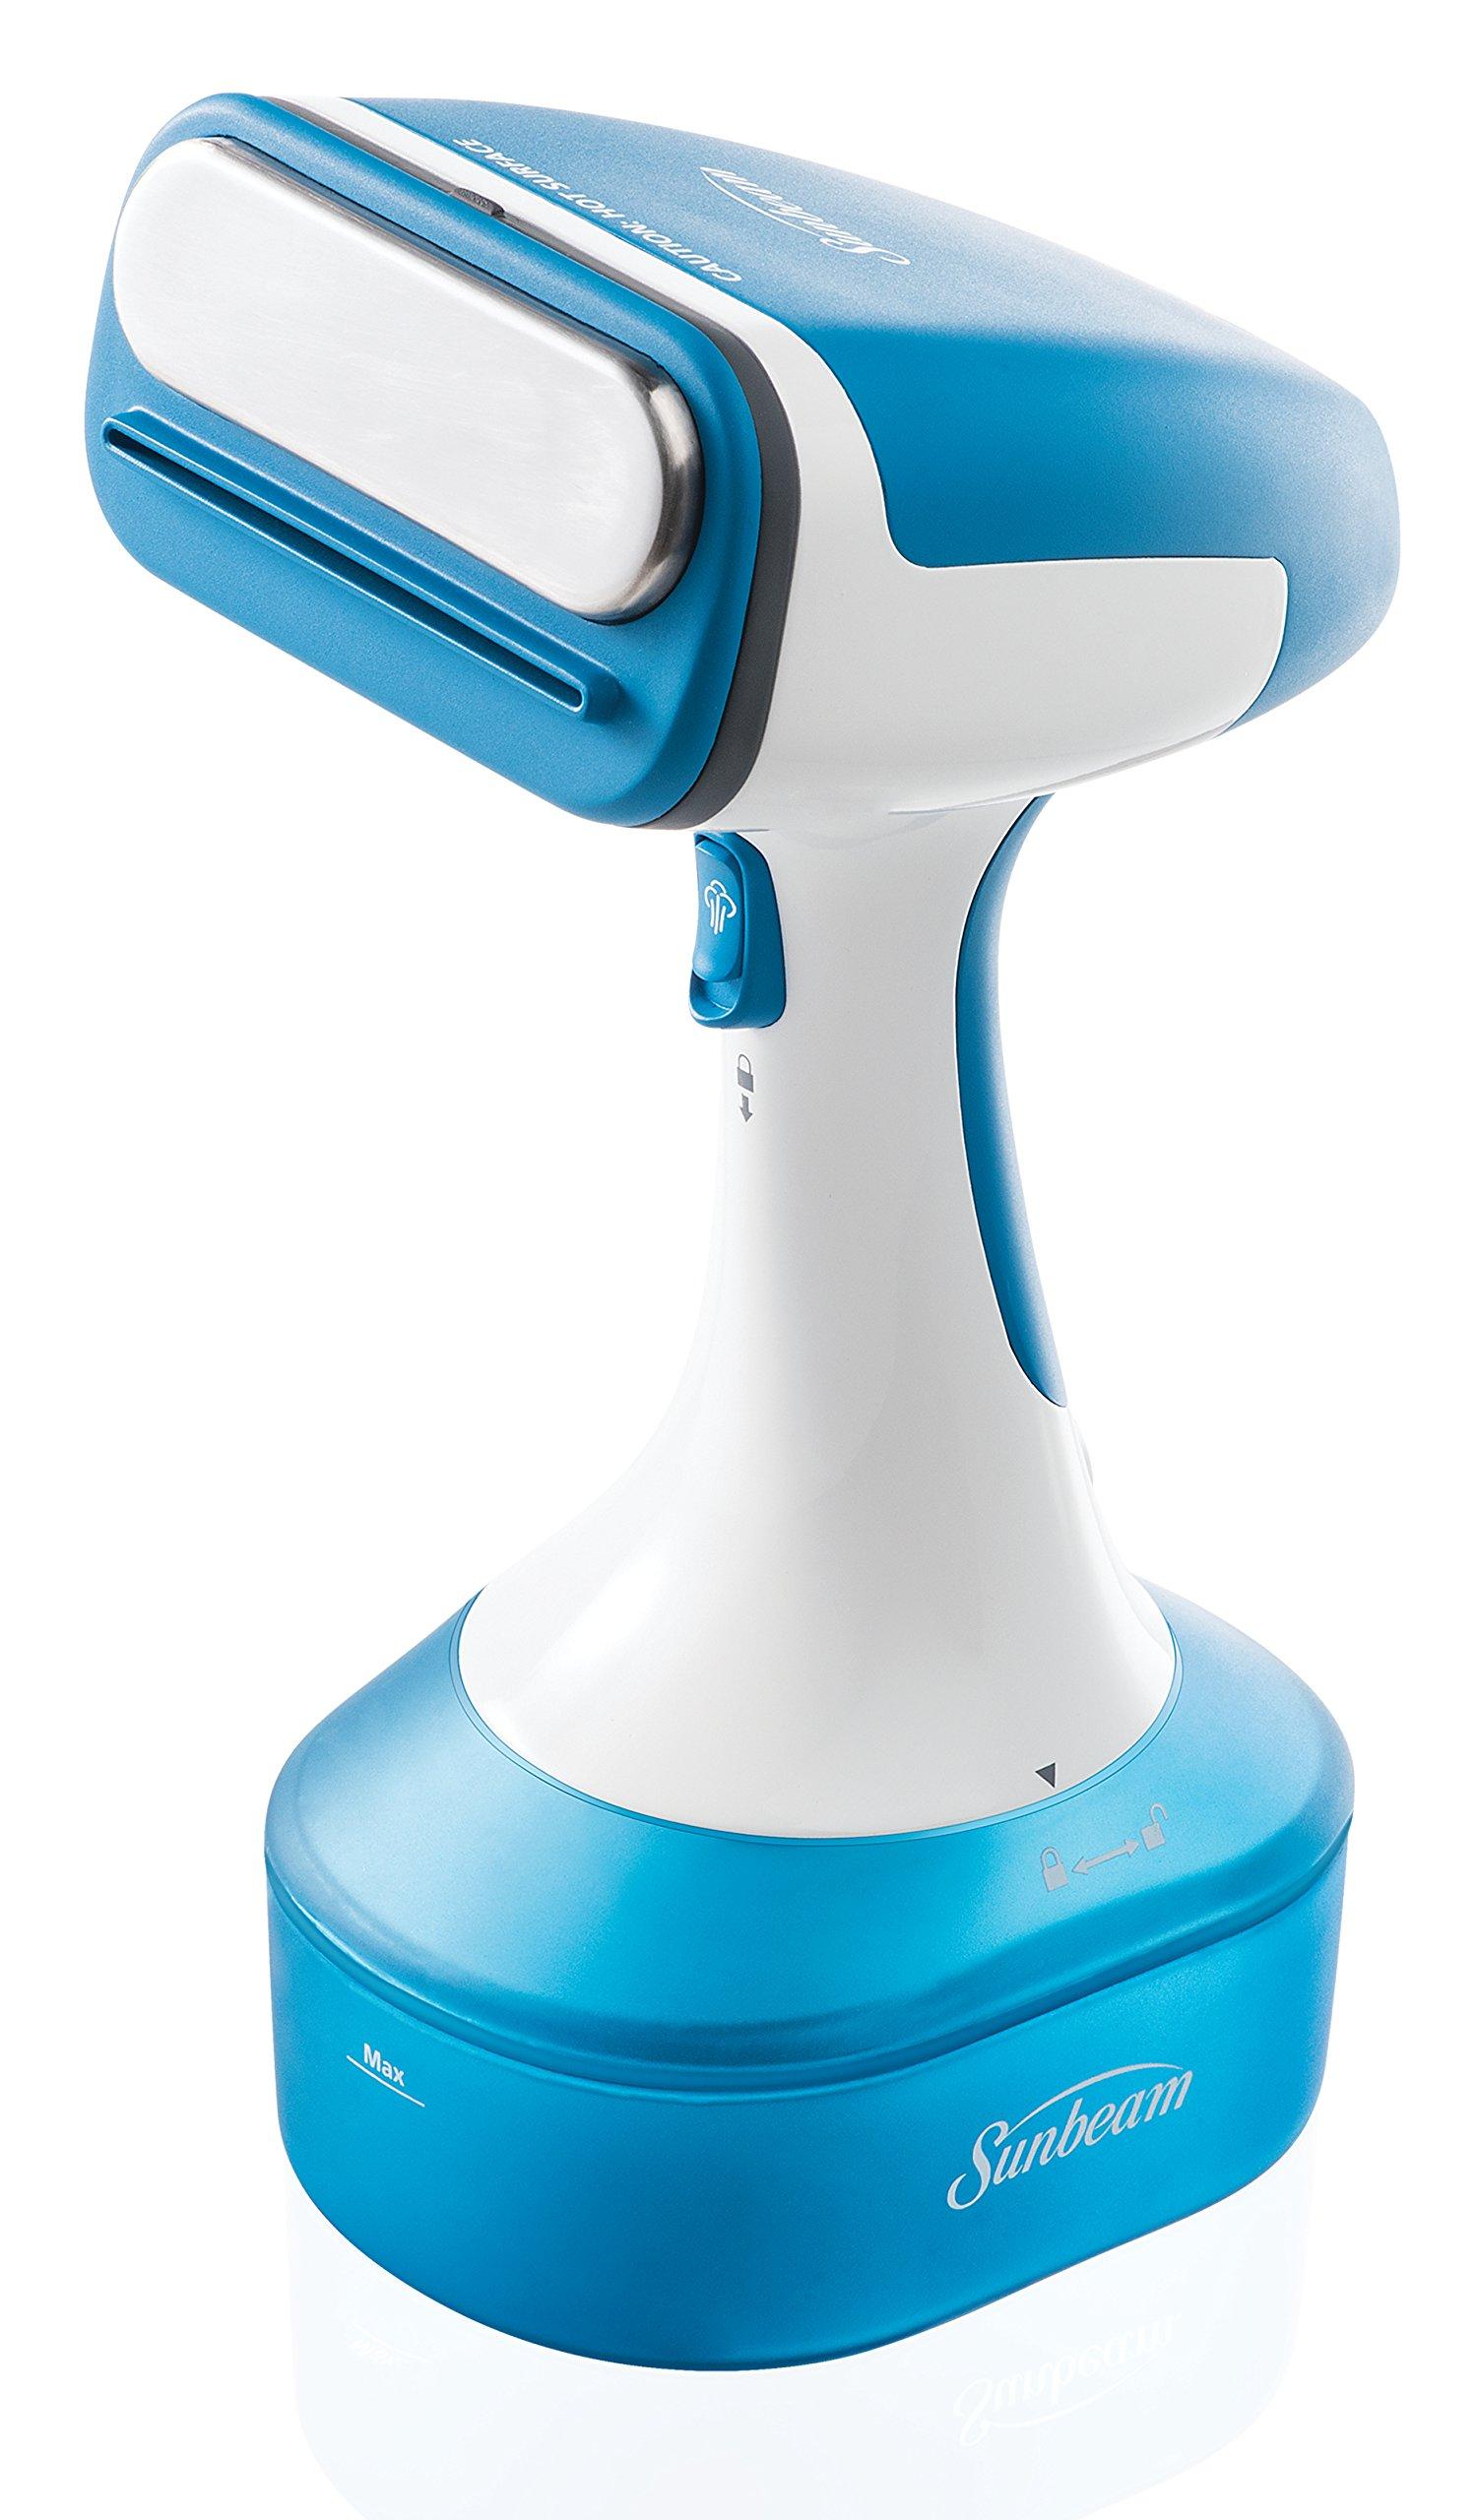 sunbeam-handheld-steam-press